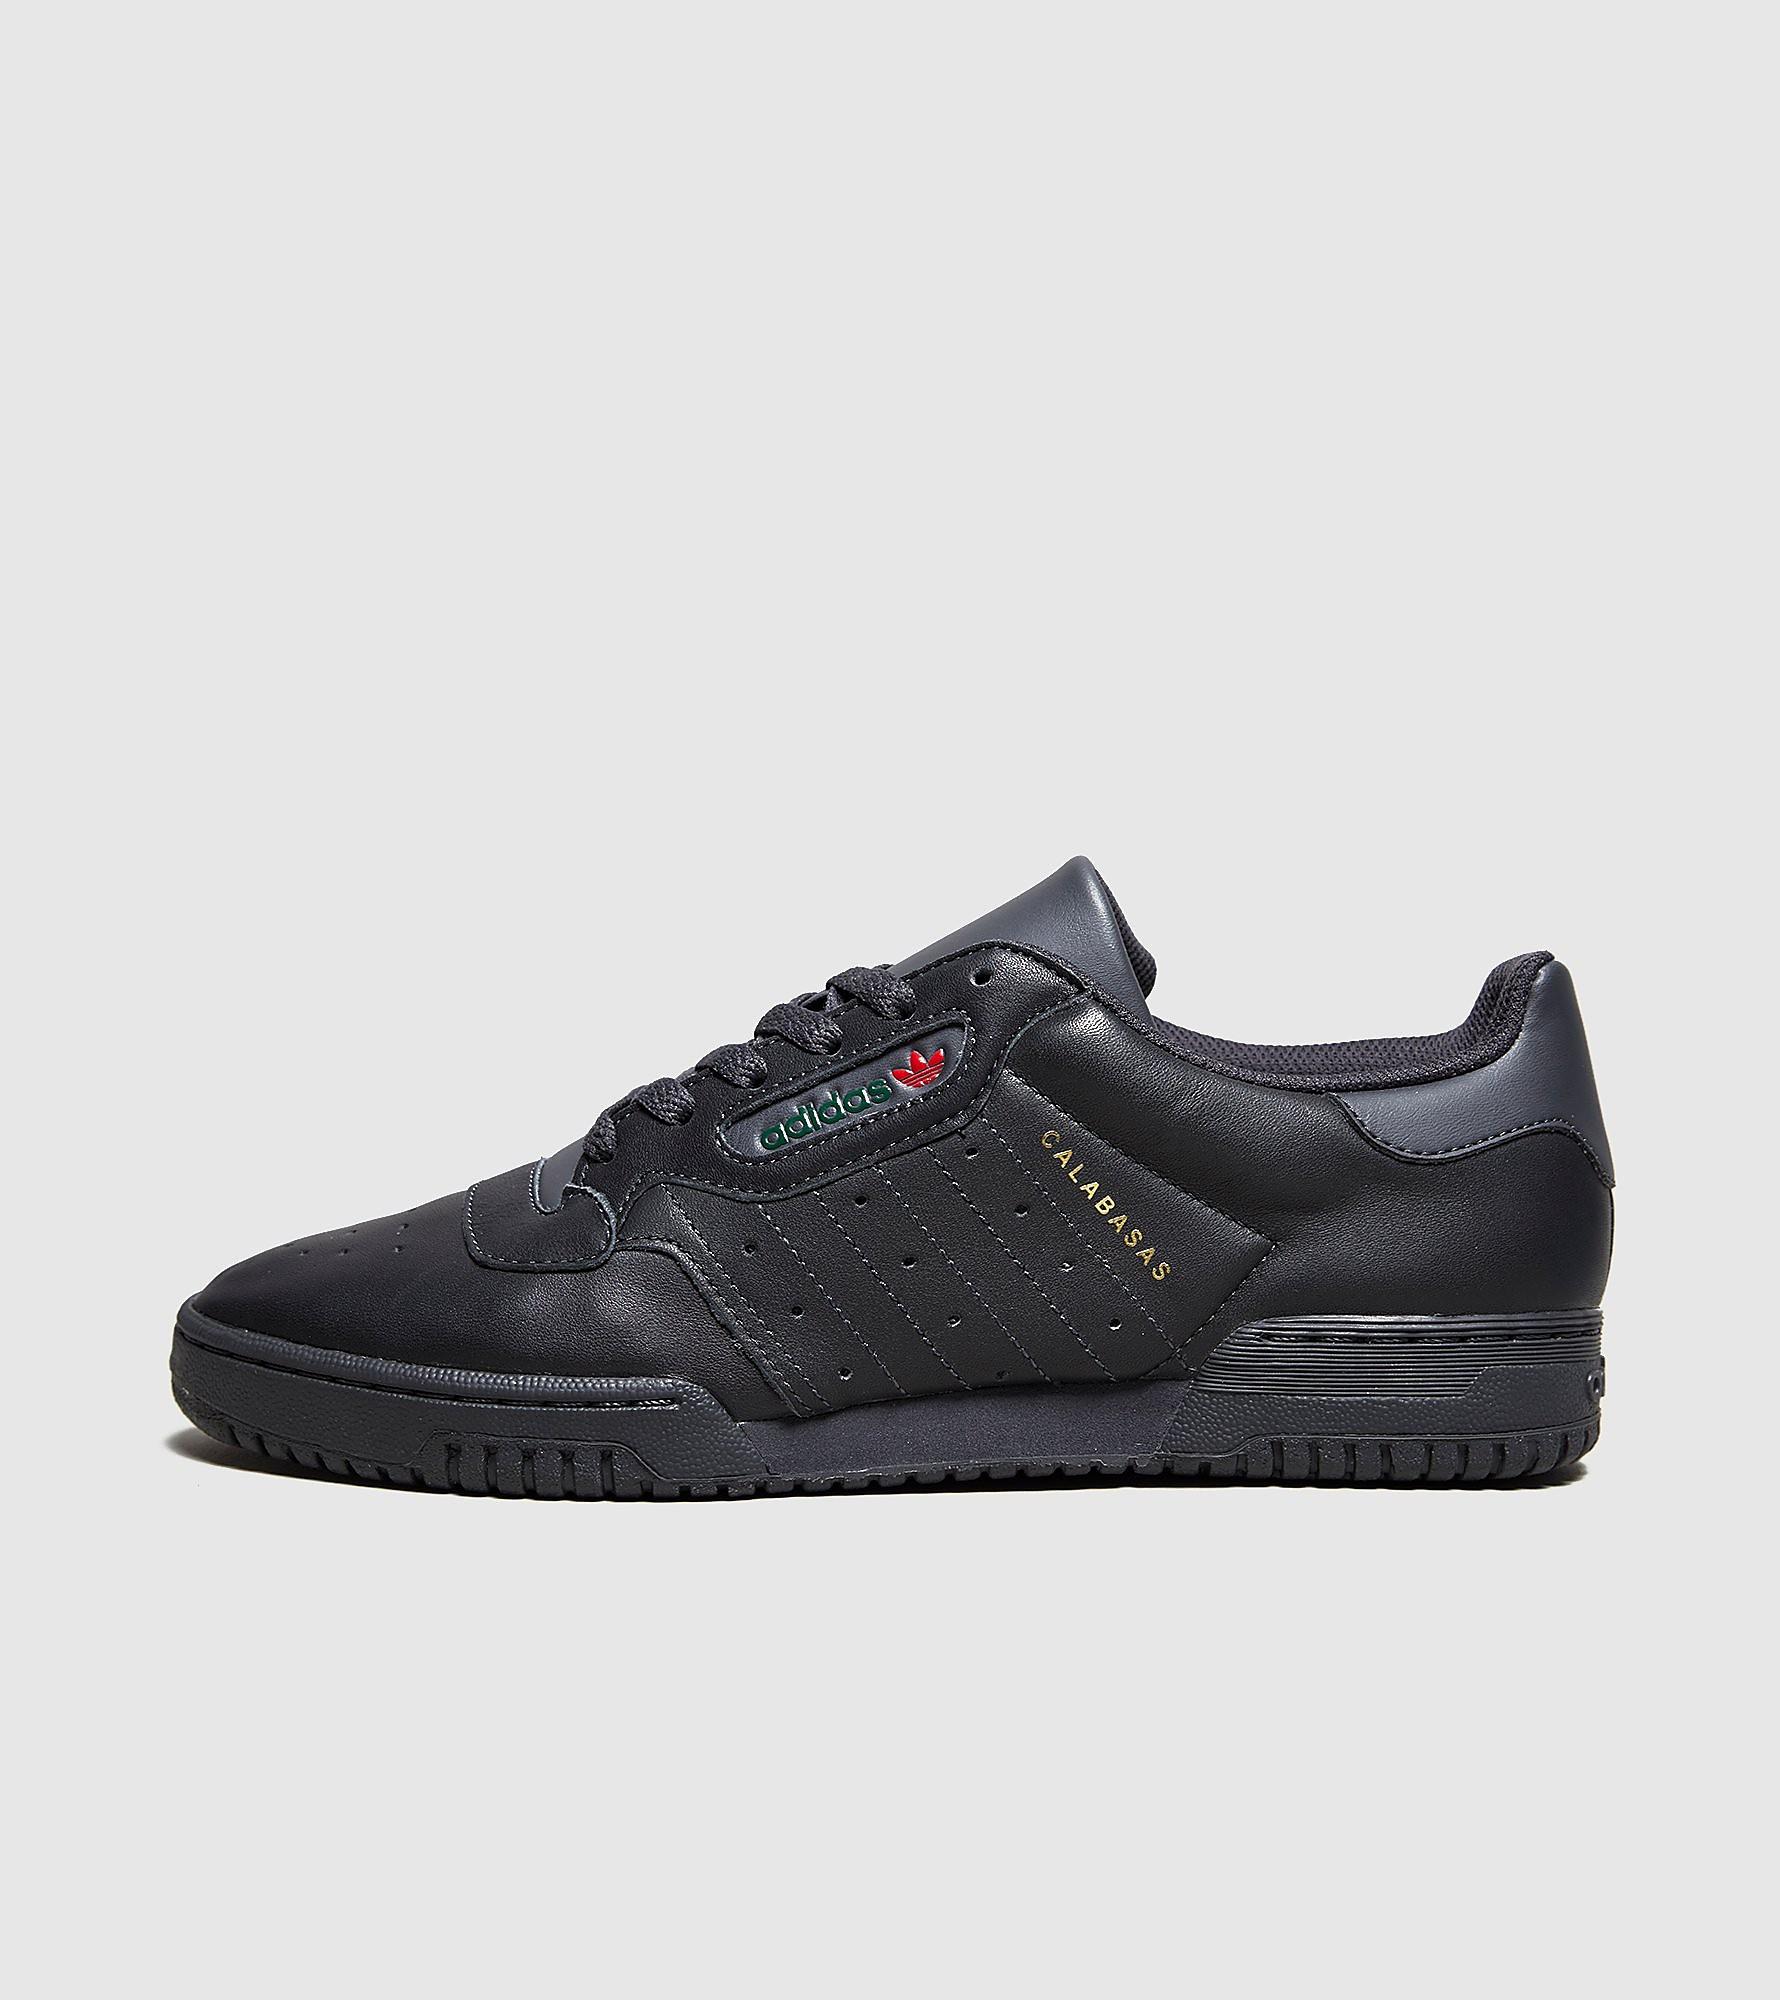 adidas Originals Yeezy Powerphase